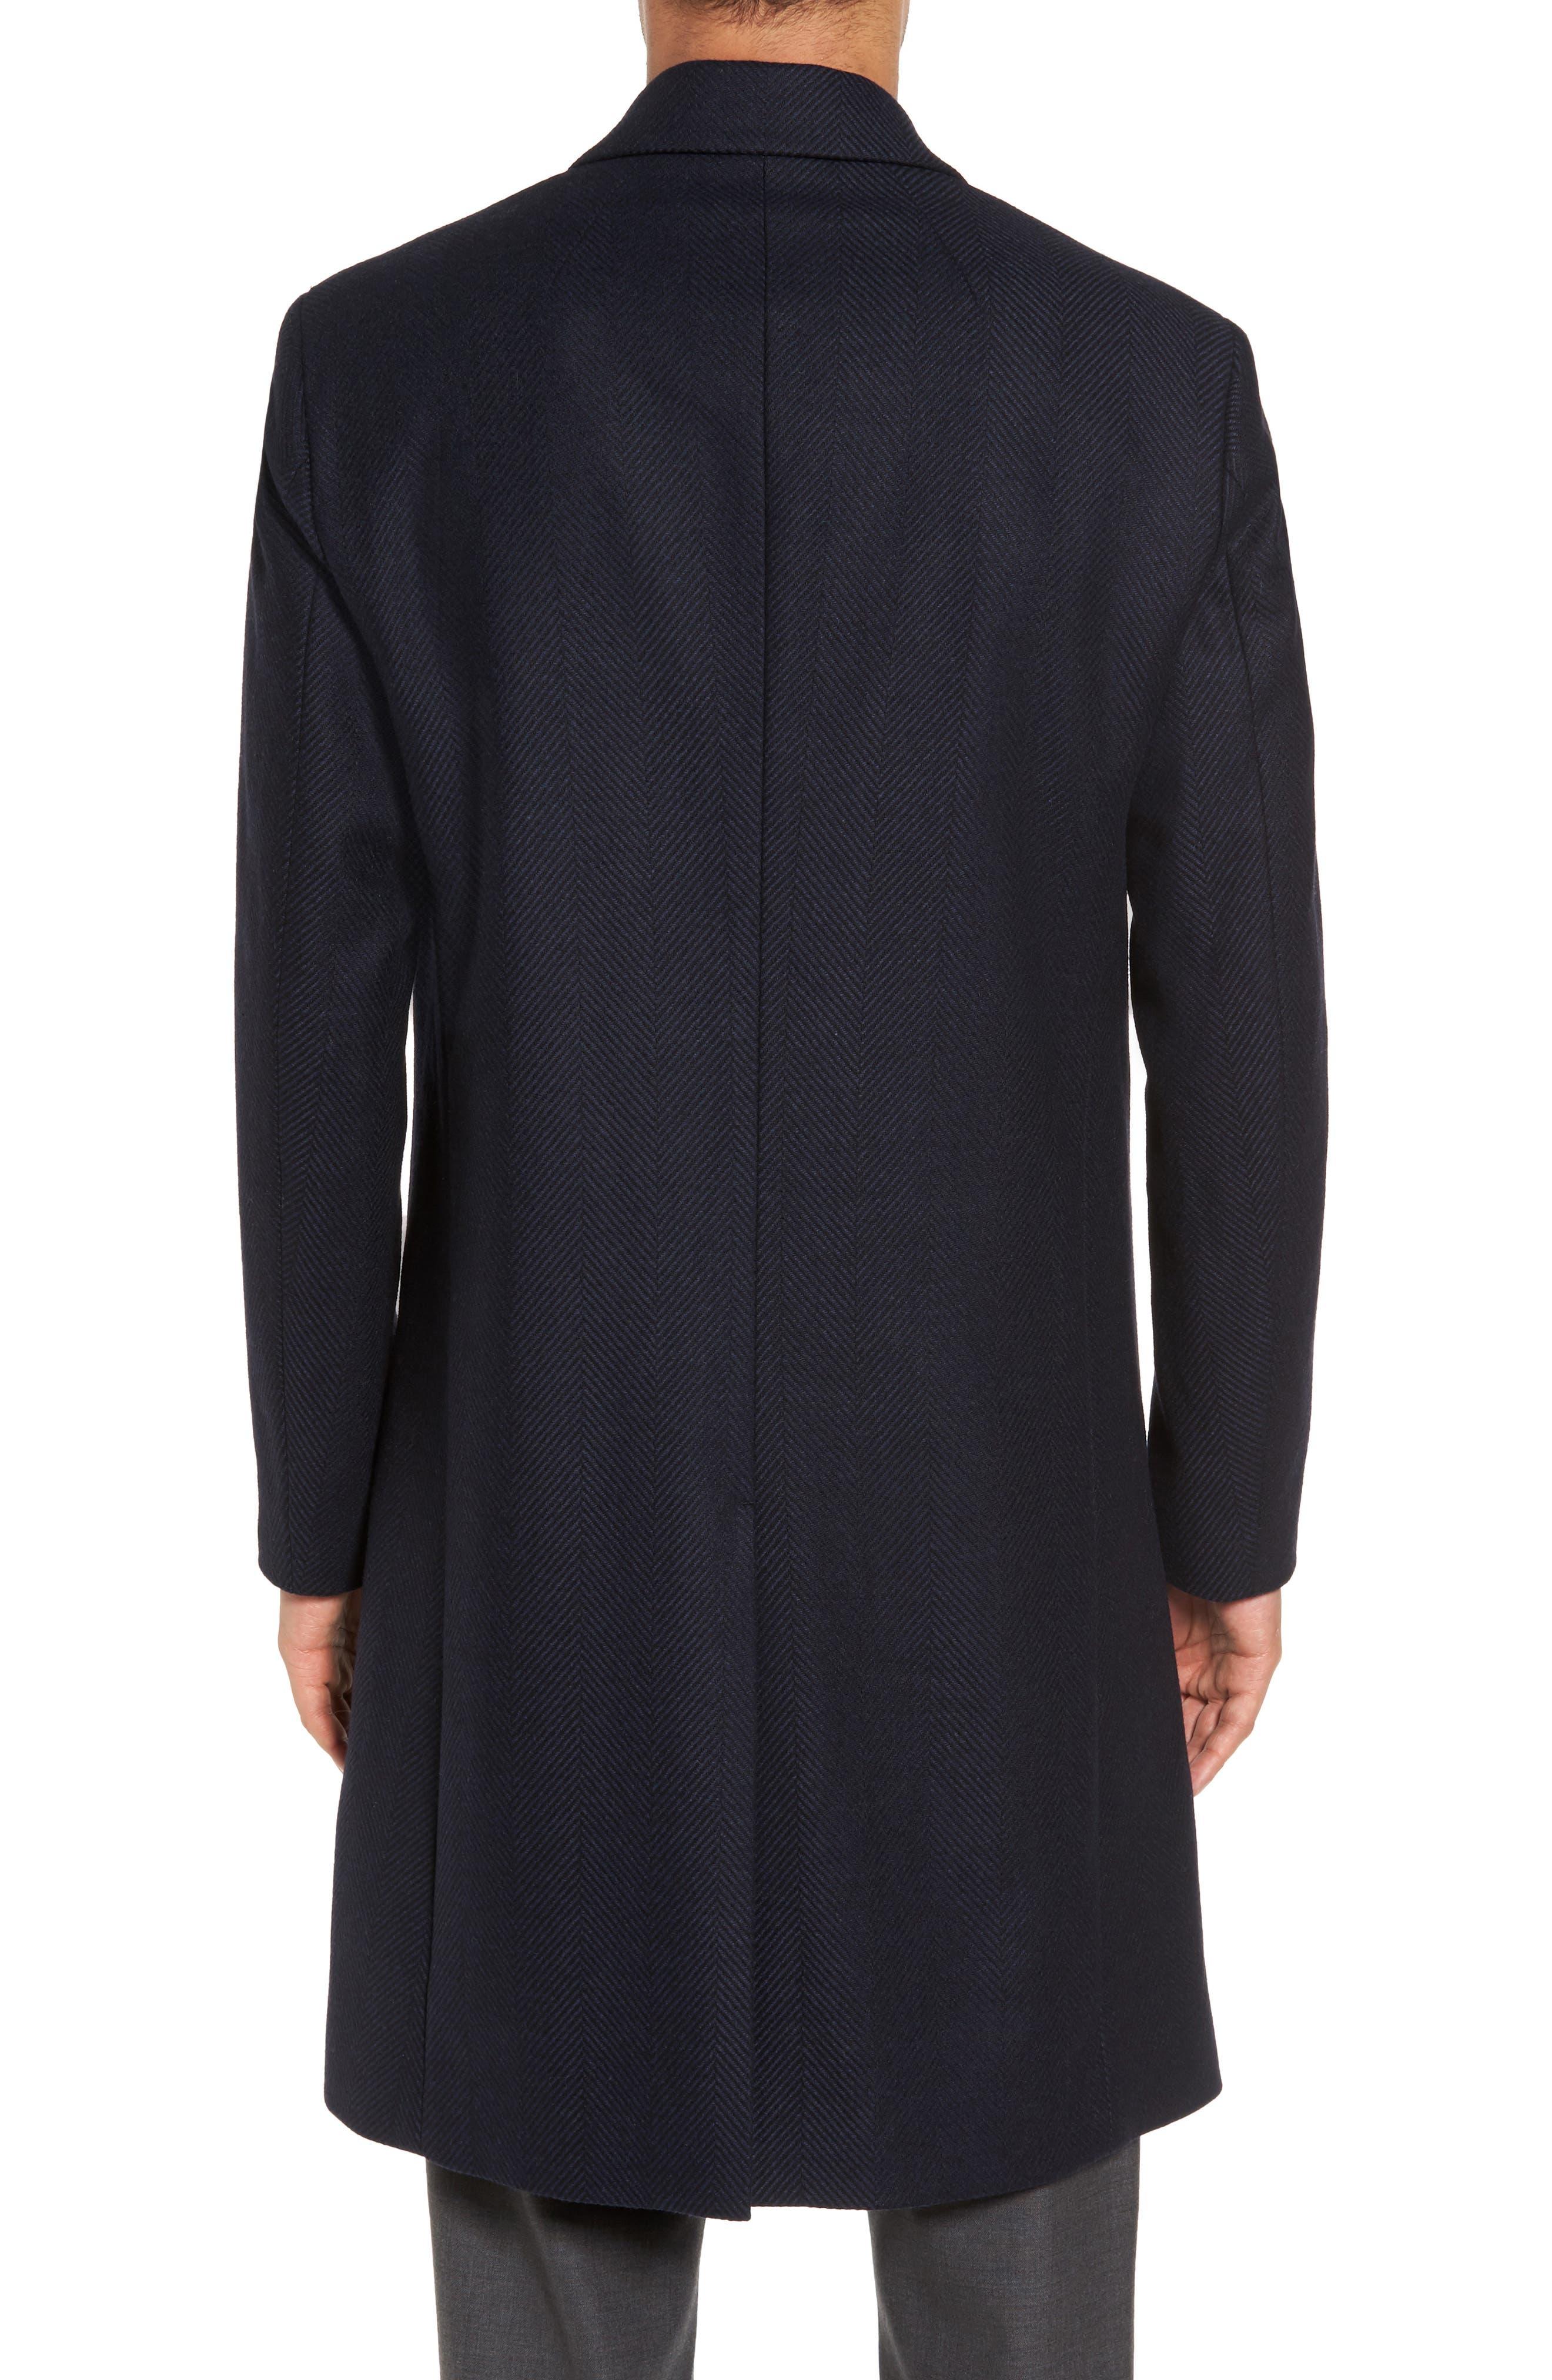 Bower Herringbone Wool Blend Topcoat,                             Alternate thumbnail 2, color,                             Liberty Multi